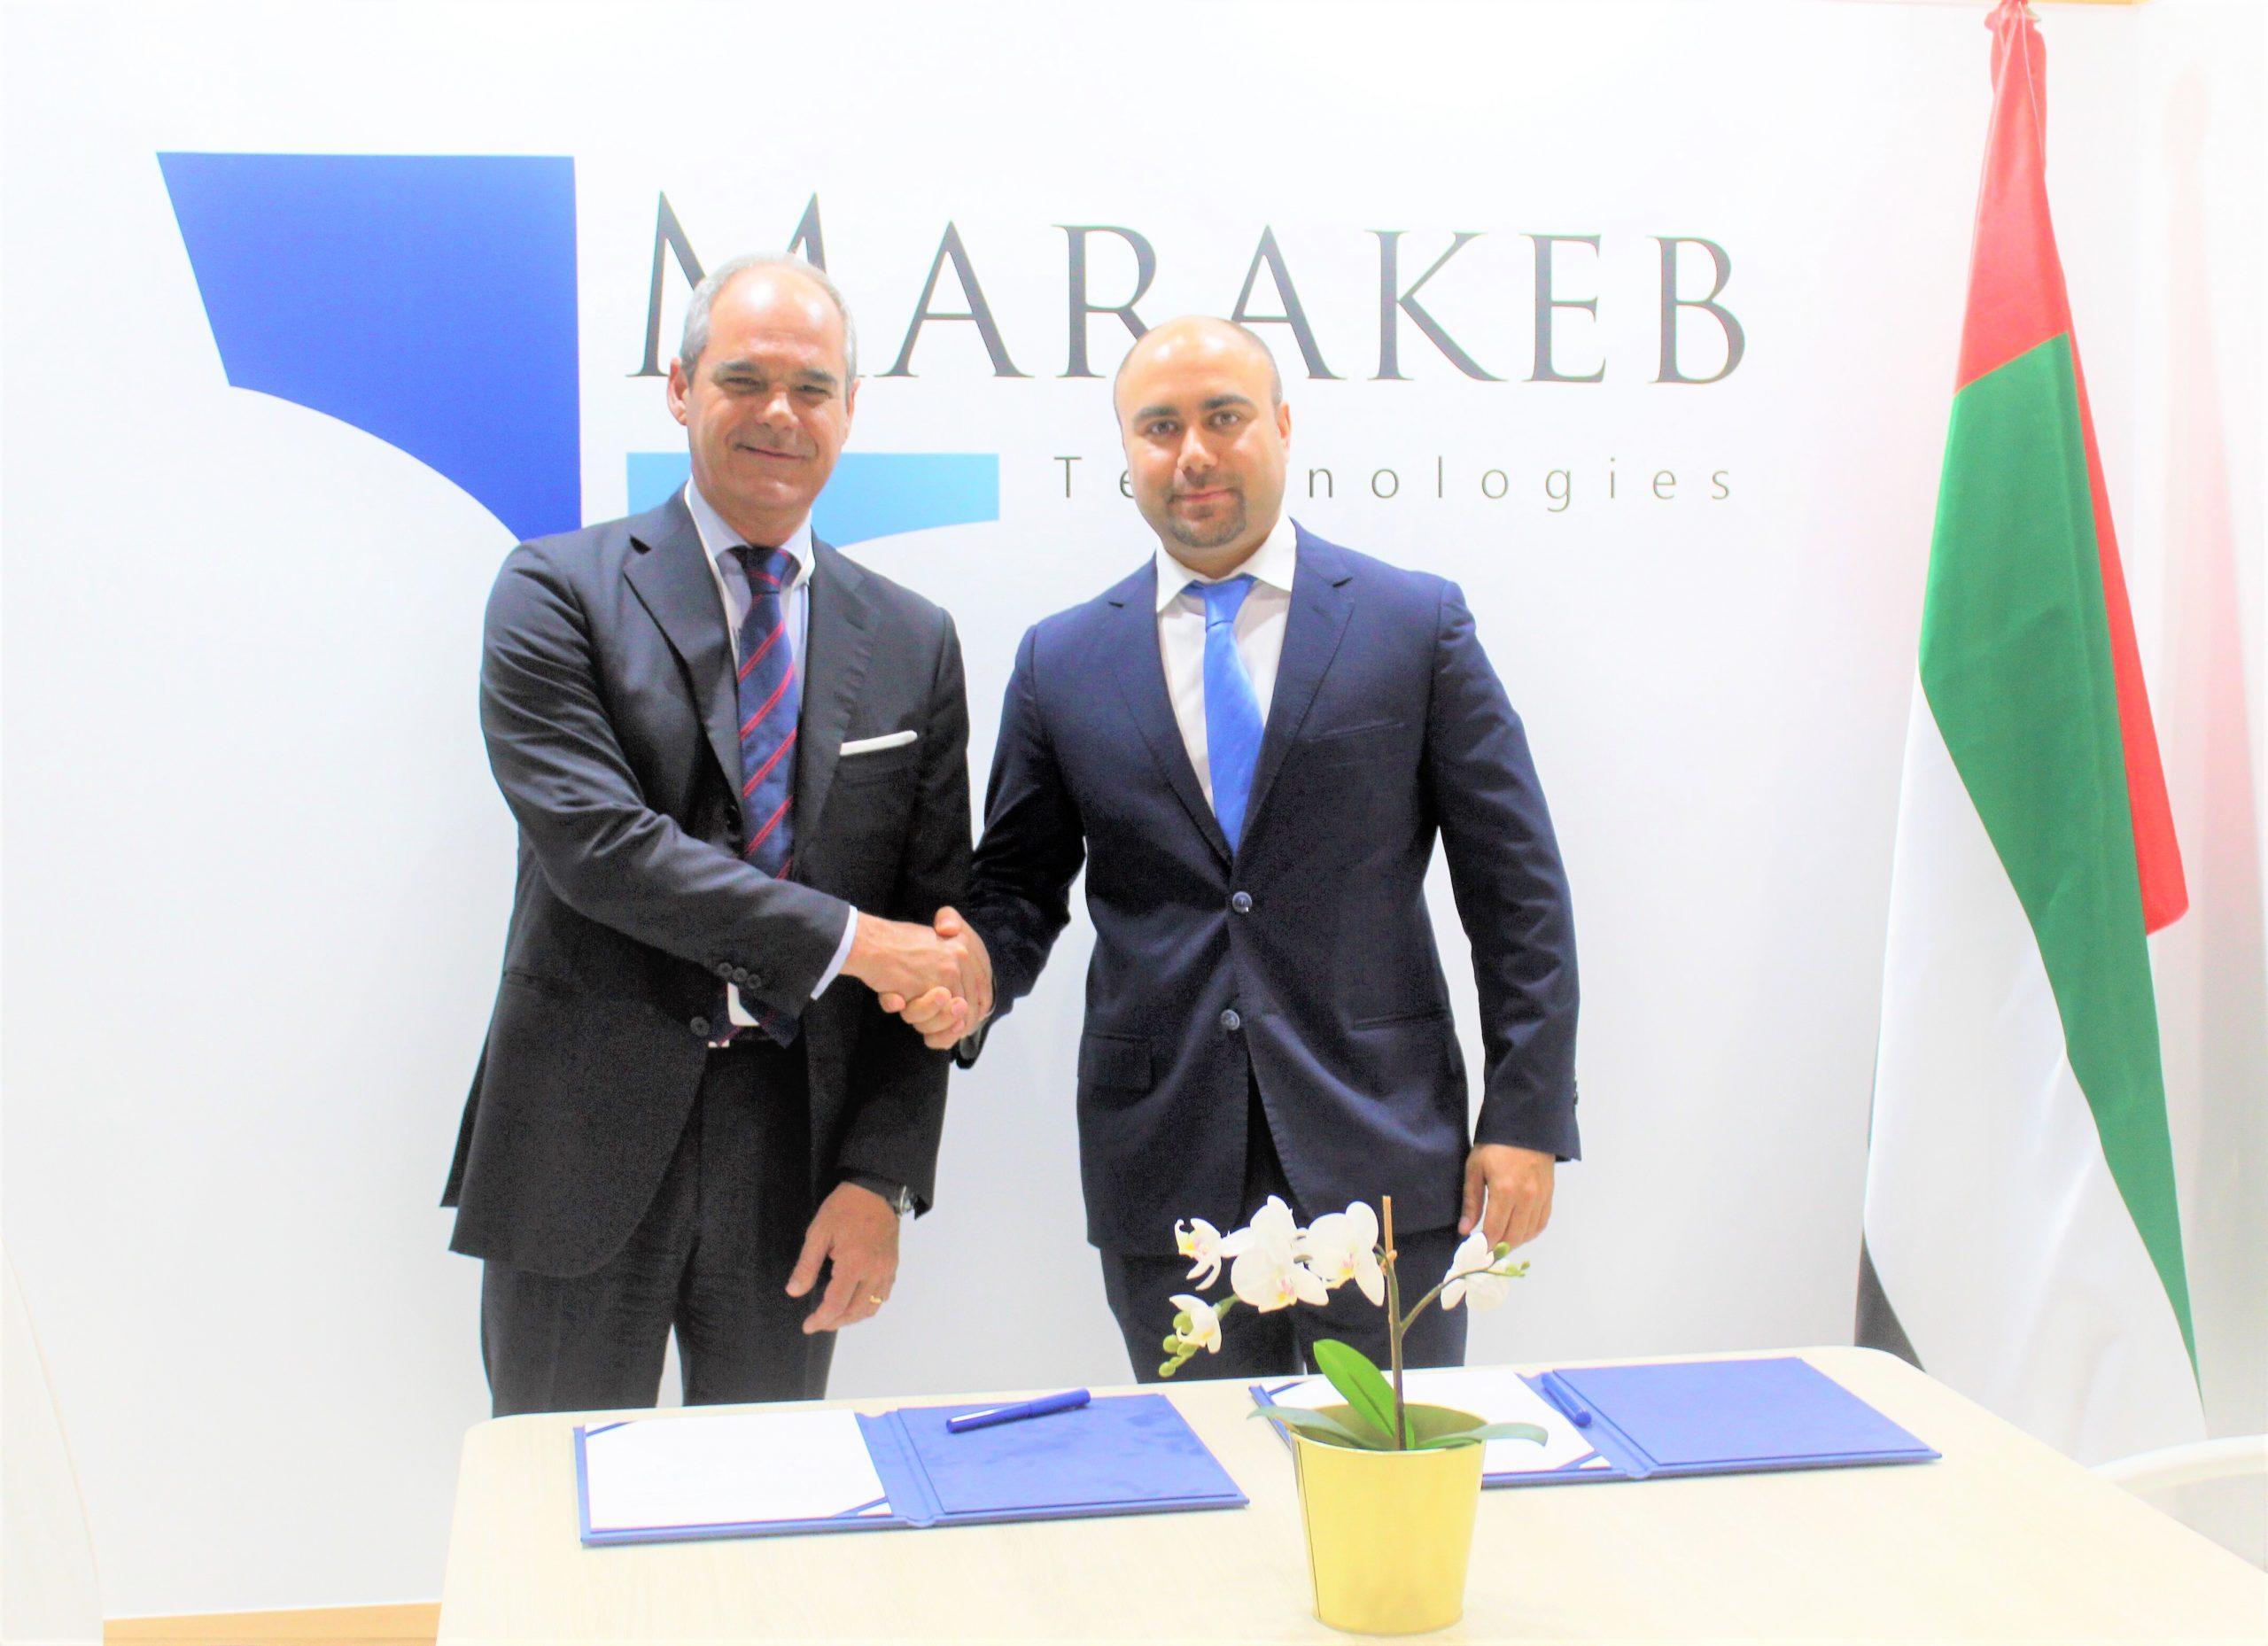 Marakeb Technologies